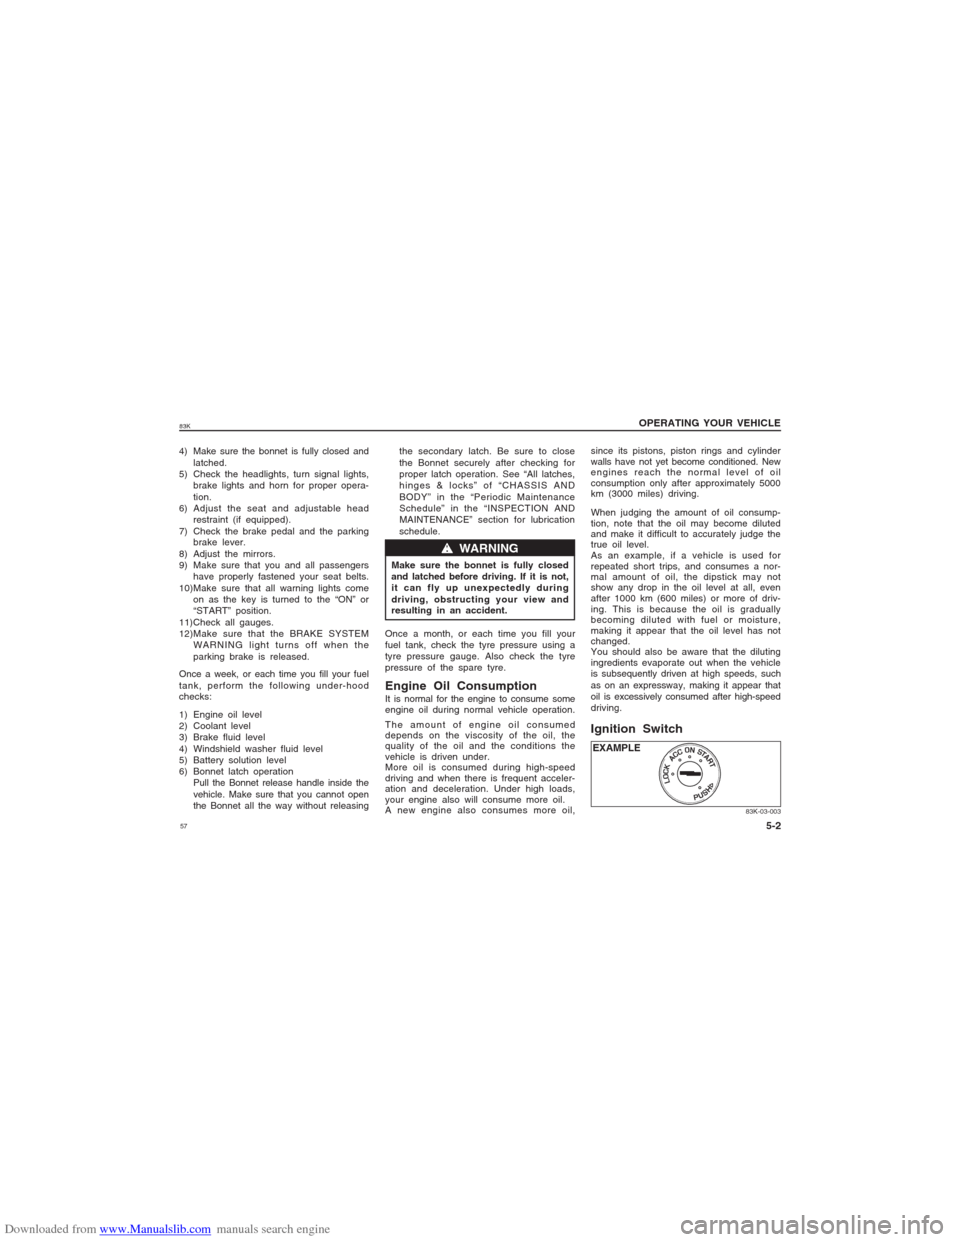 SUZUKI MARUTI 2005 1.G Workshop Manual (136 Pages)